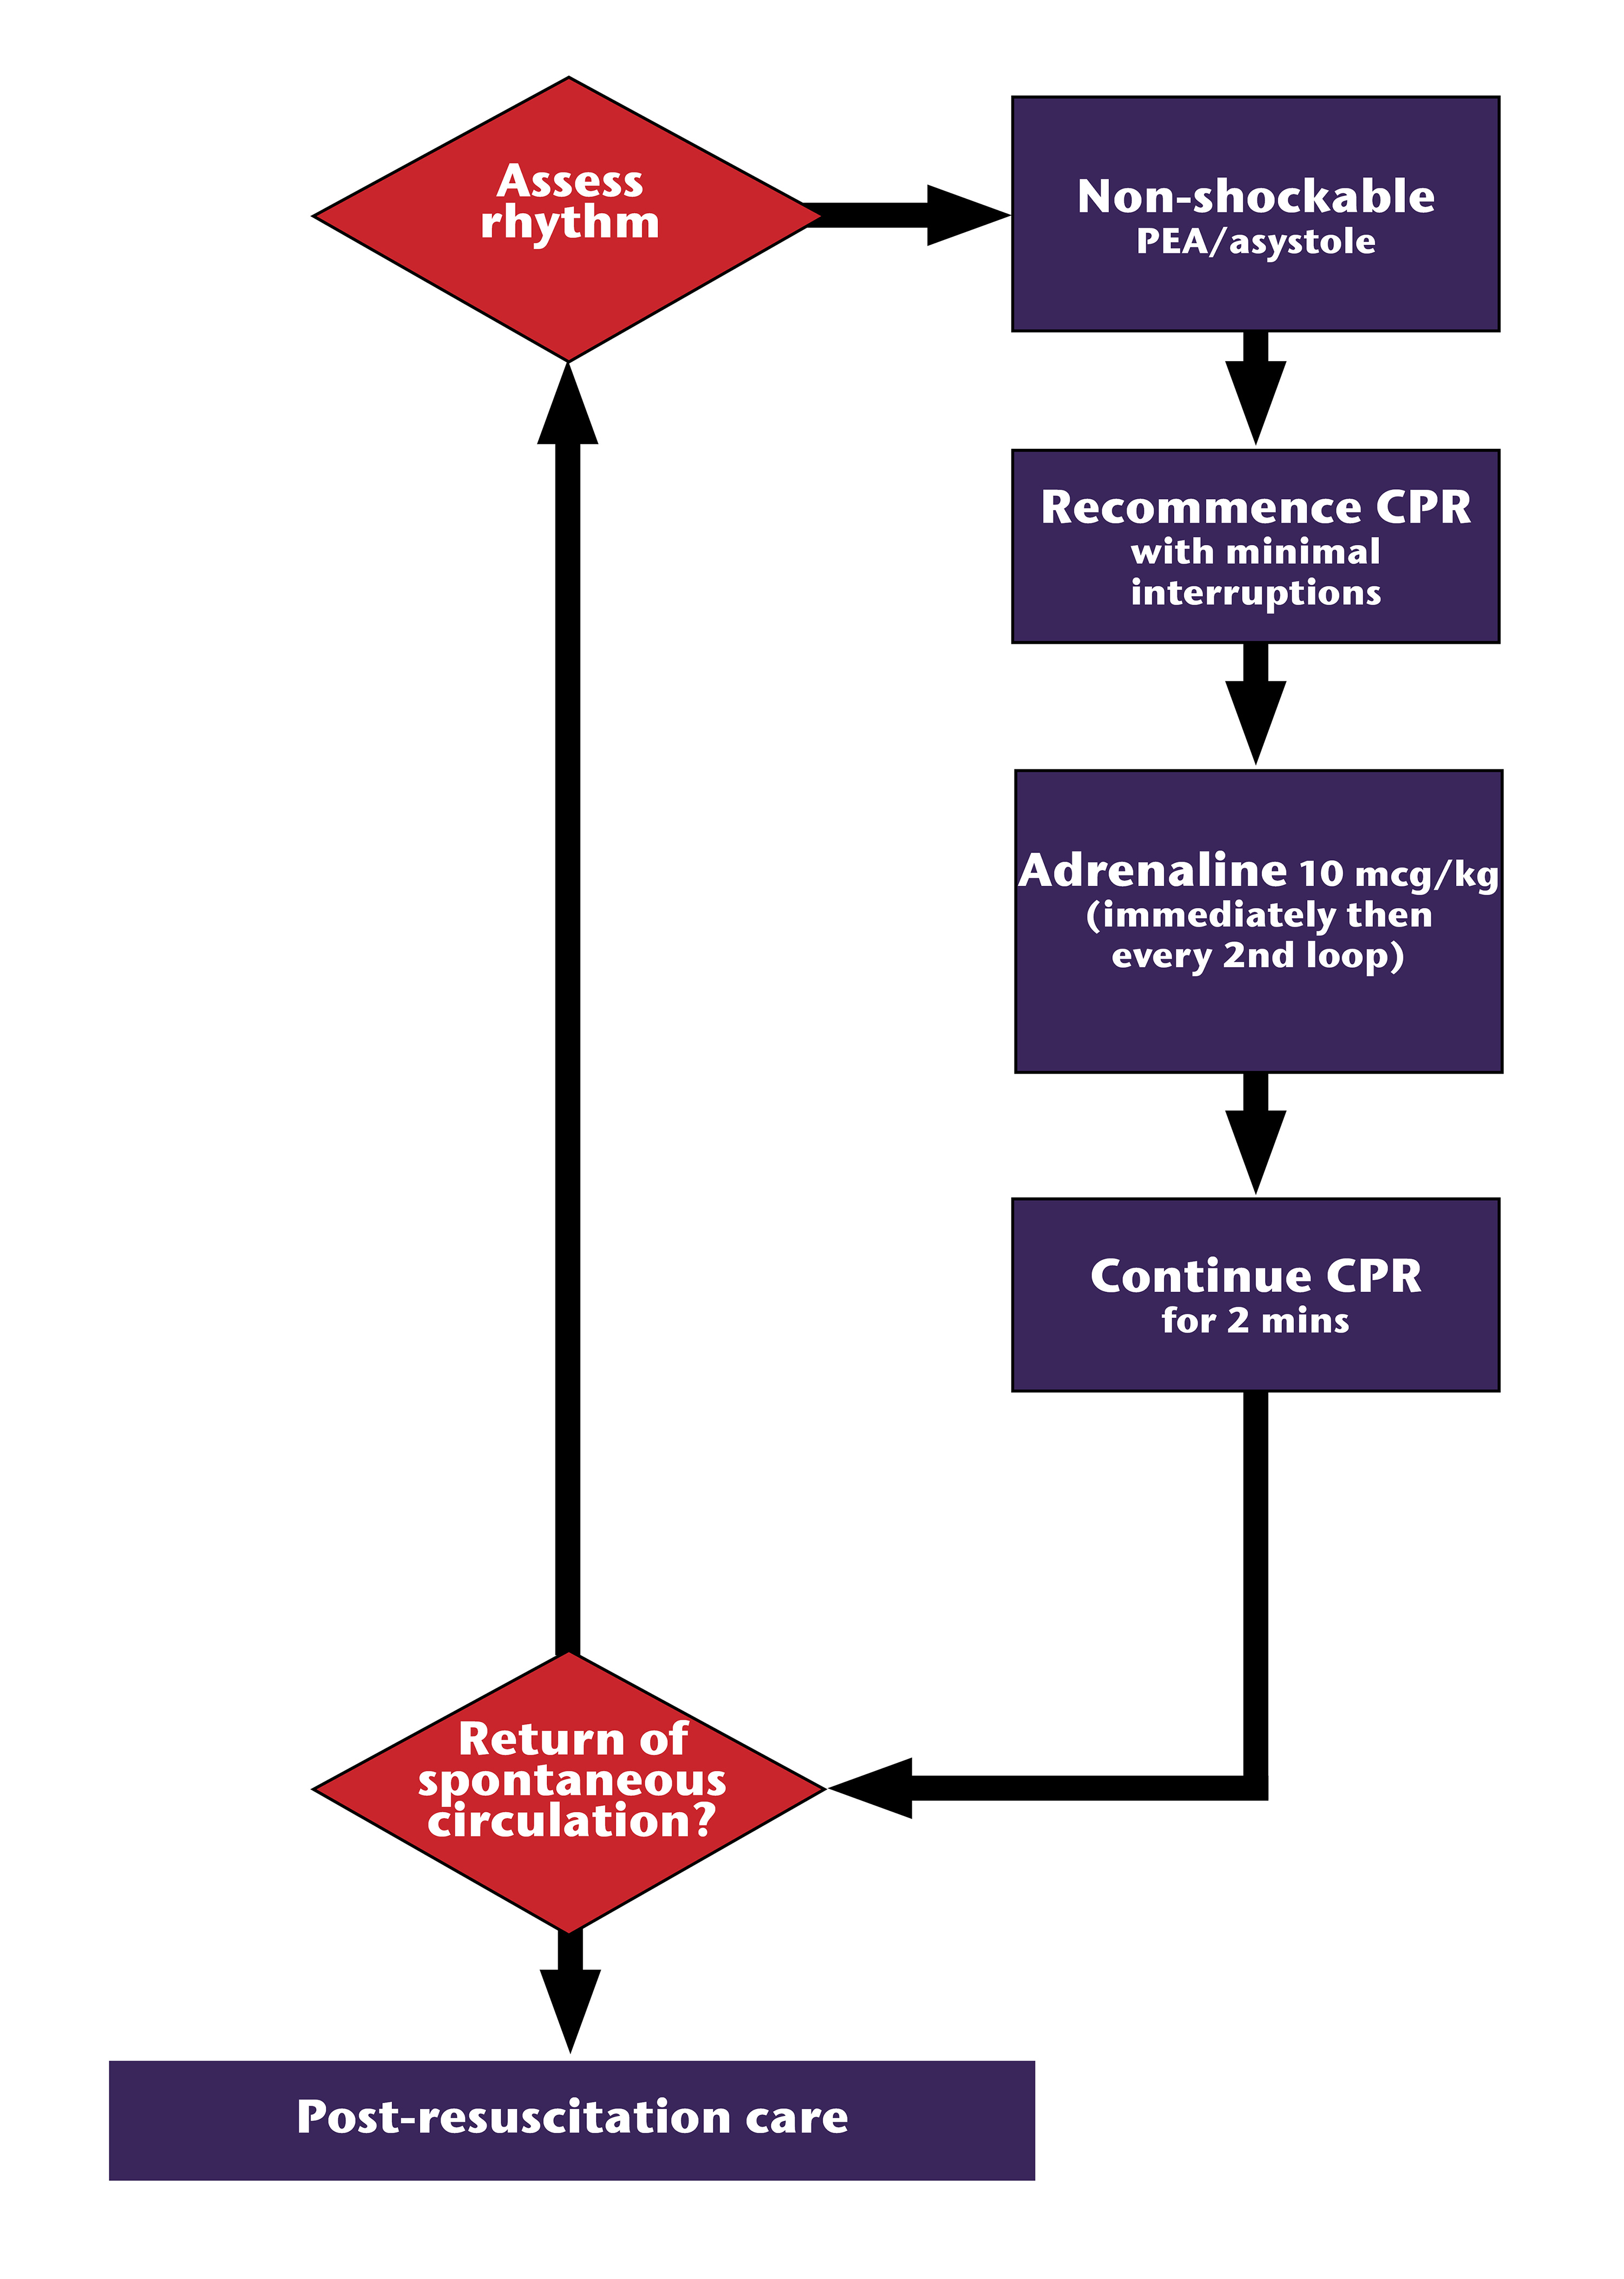 Figure 20.4 - Asystole & PEA management